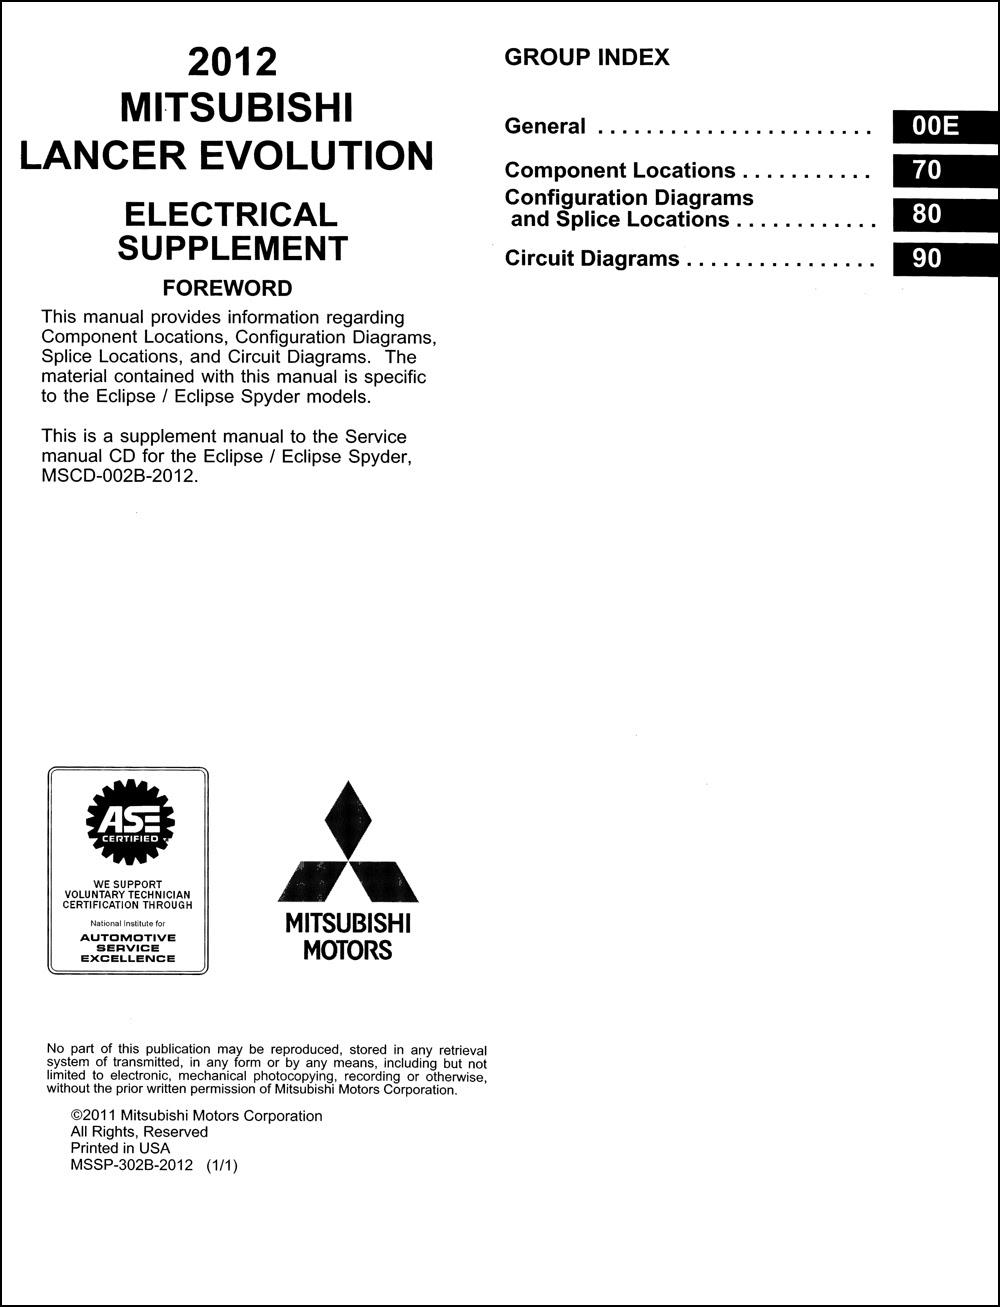 Diagram 2003 Mitsubishi Lancer Evolution Wiring Diagram Original Full Version Hd Quality Diagram Original Chevydiagrams Nuitdeboutaix Fr